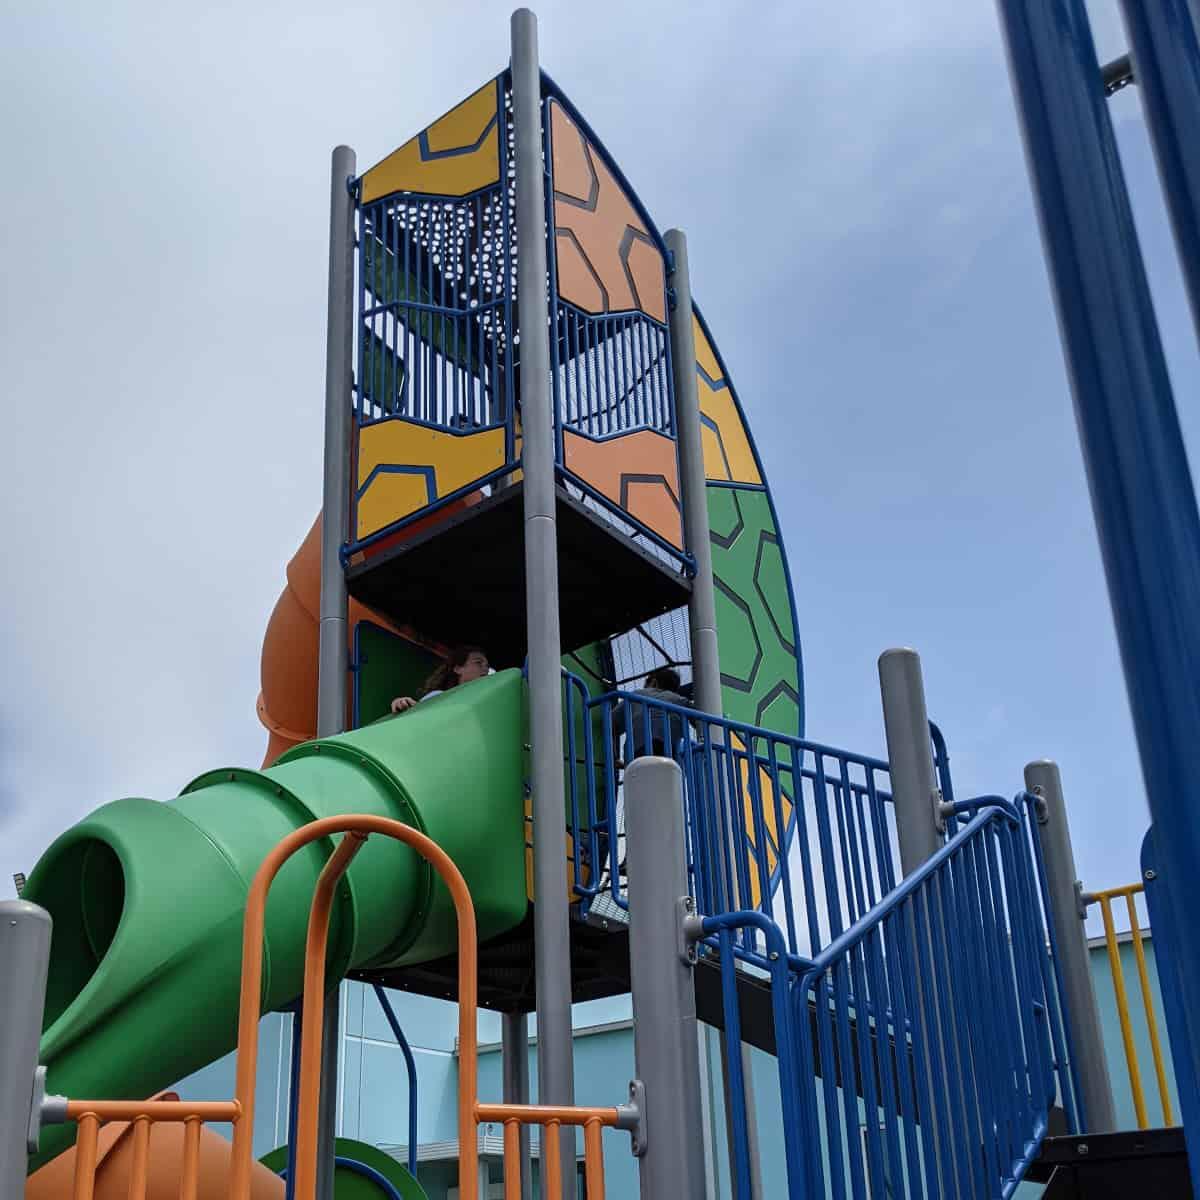 Menard Park Galveston Slides